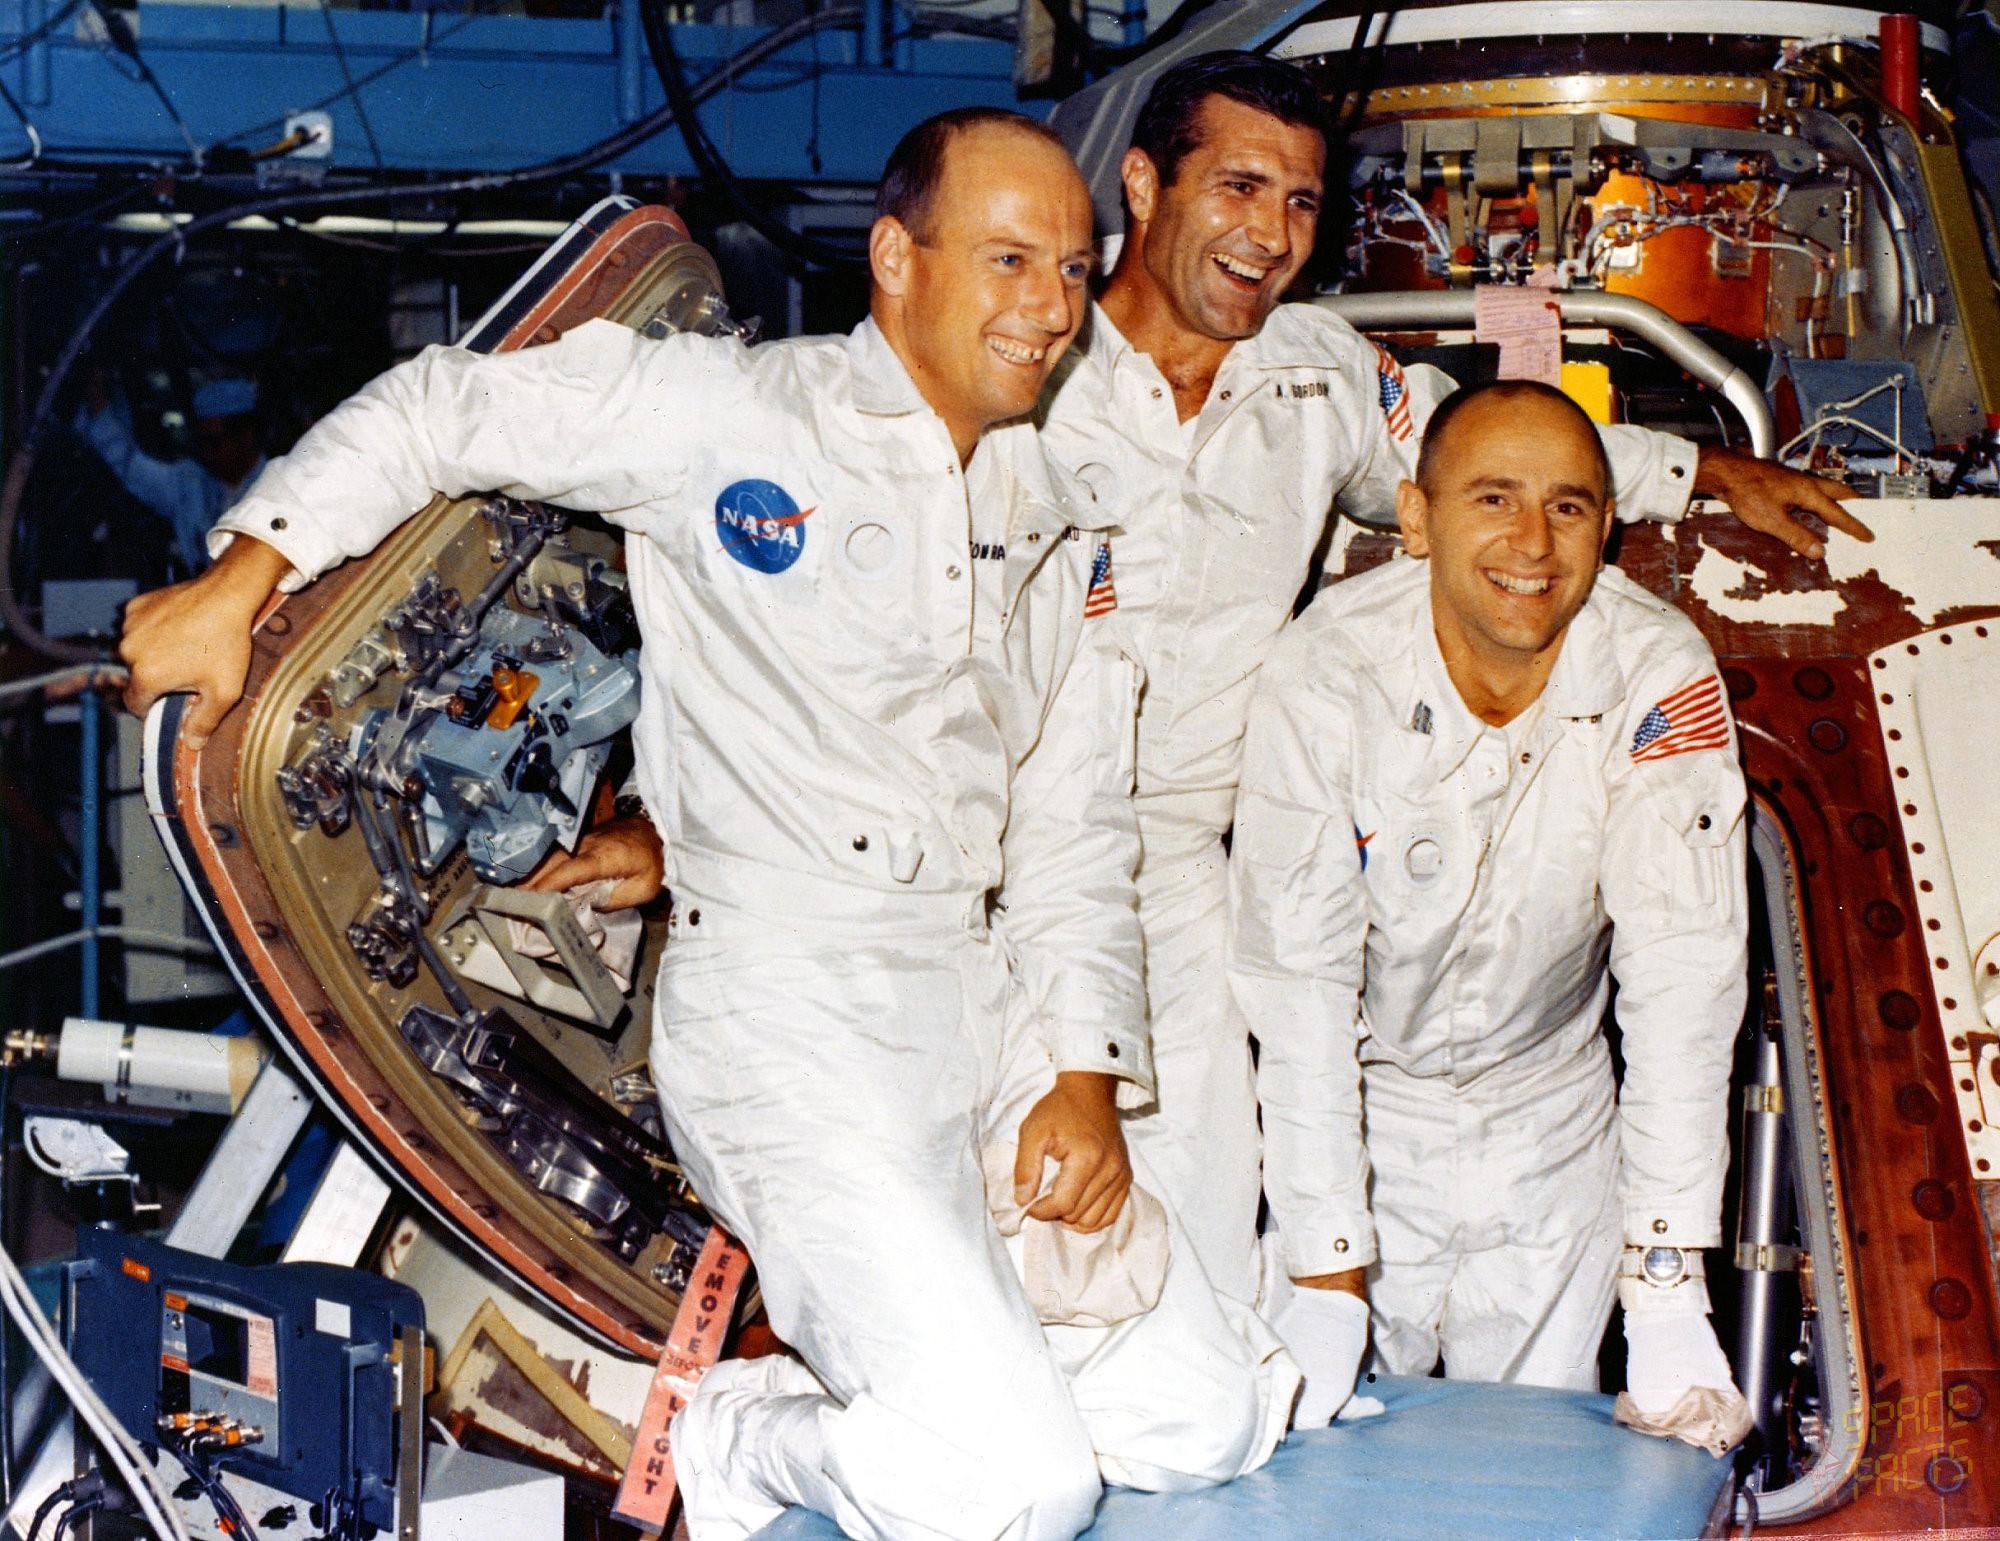 Spaceflight mission report: Apollo 9